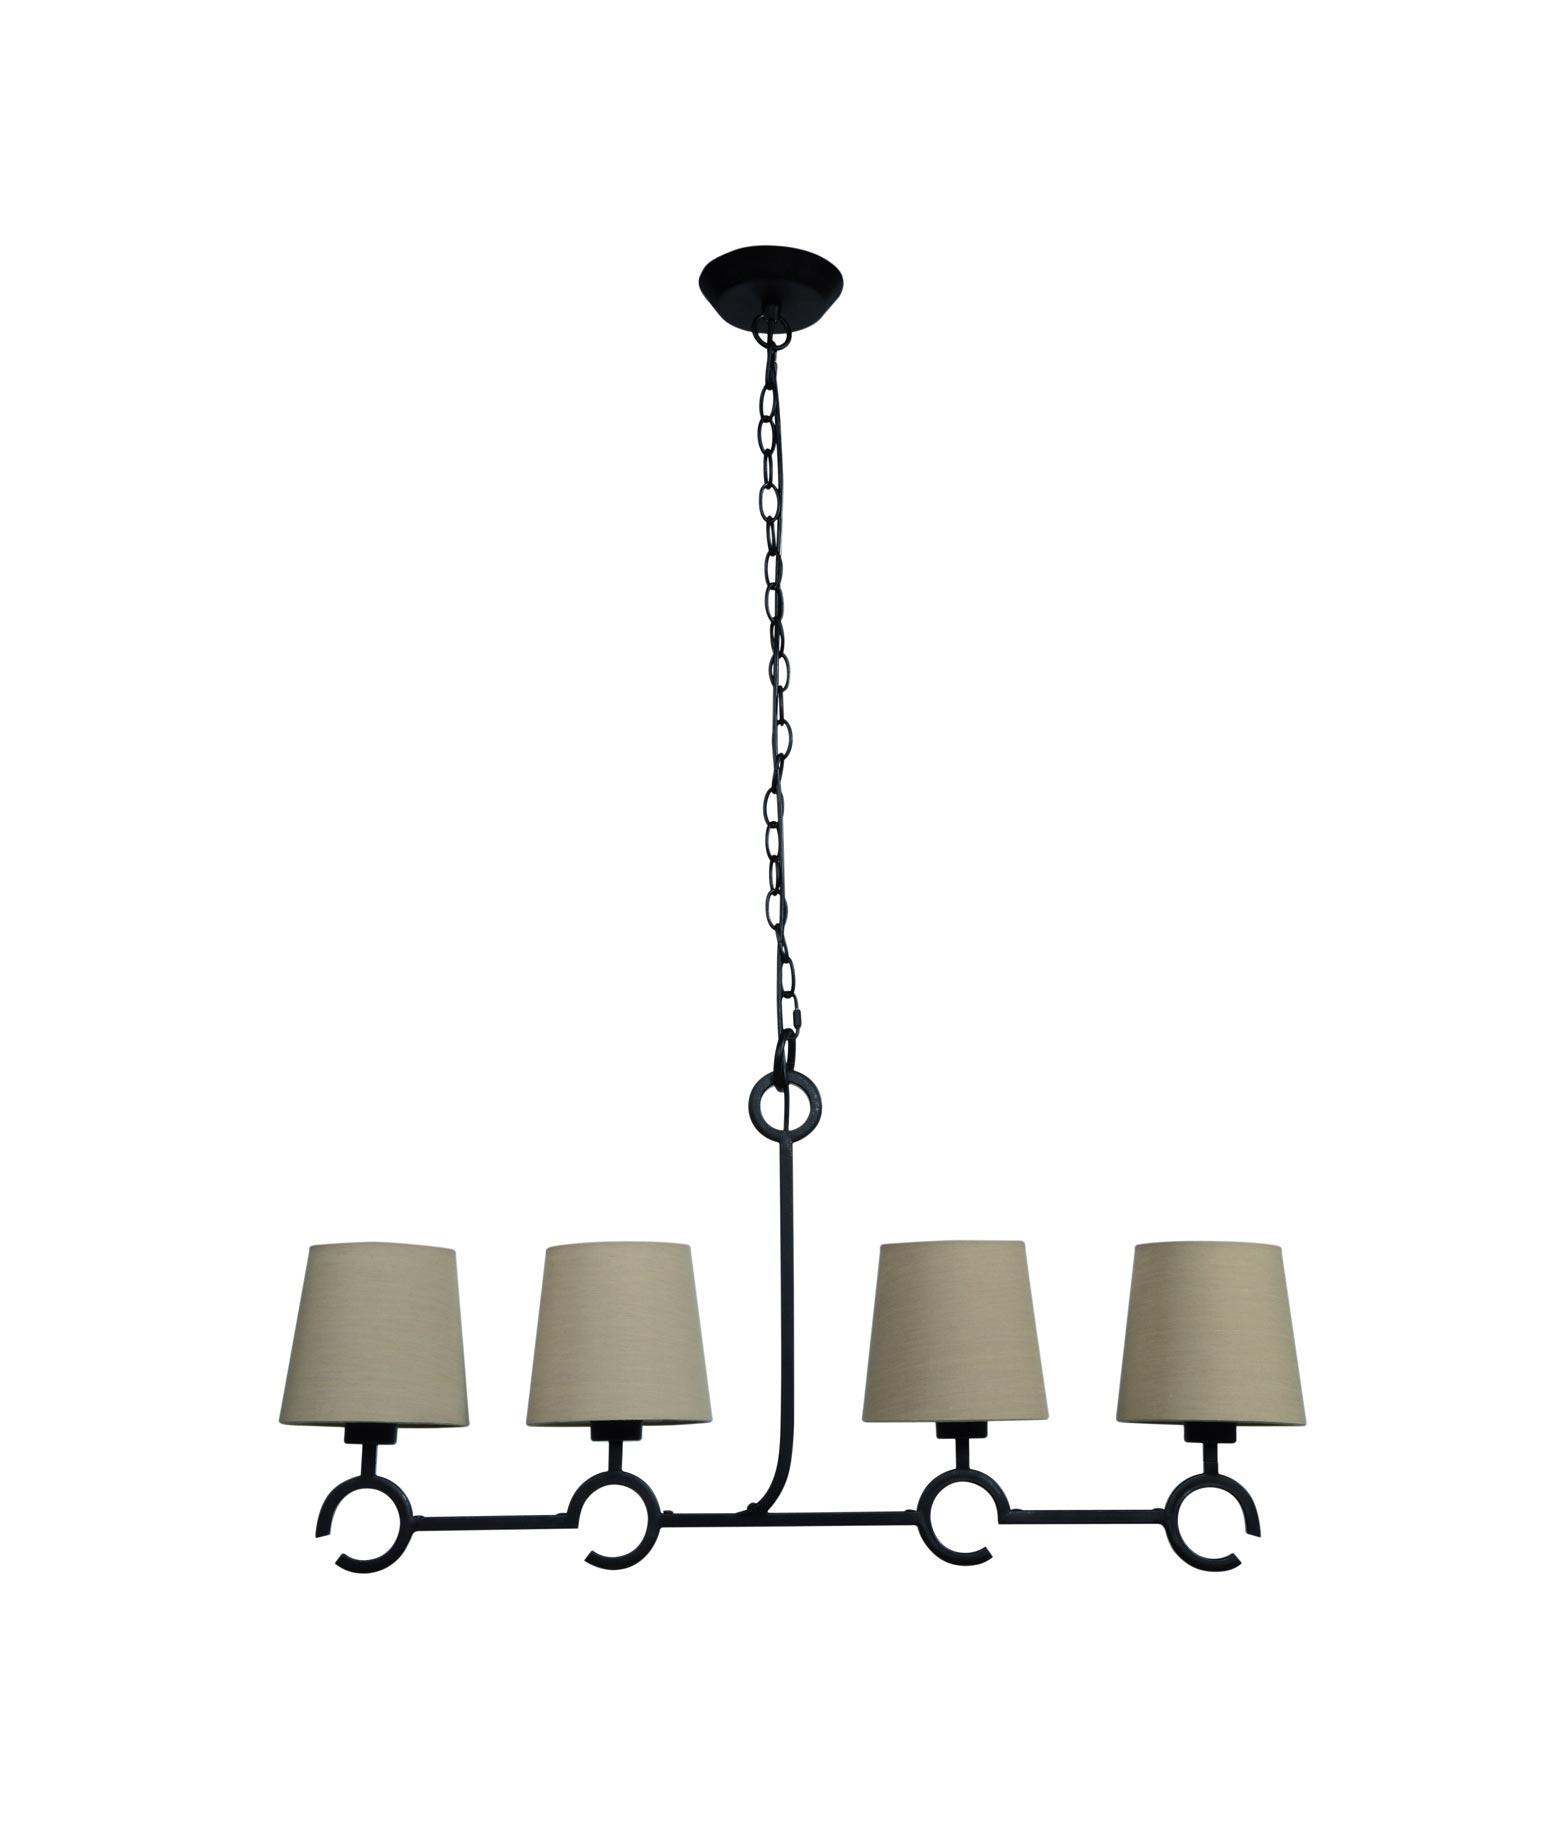 Lámpara de techo 4 luces ARGI línea